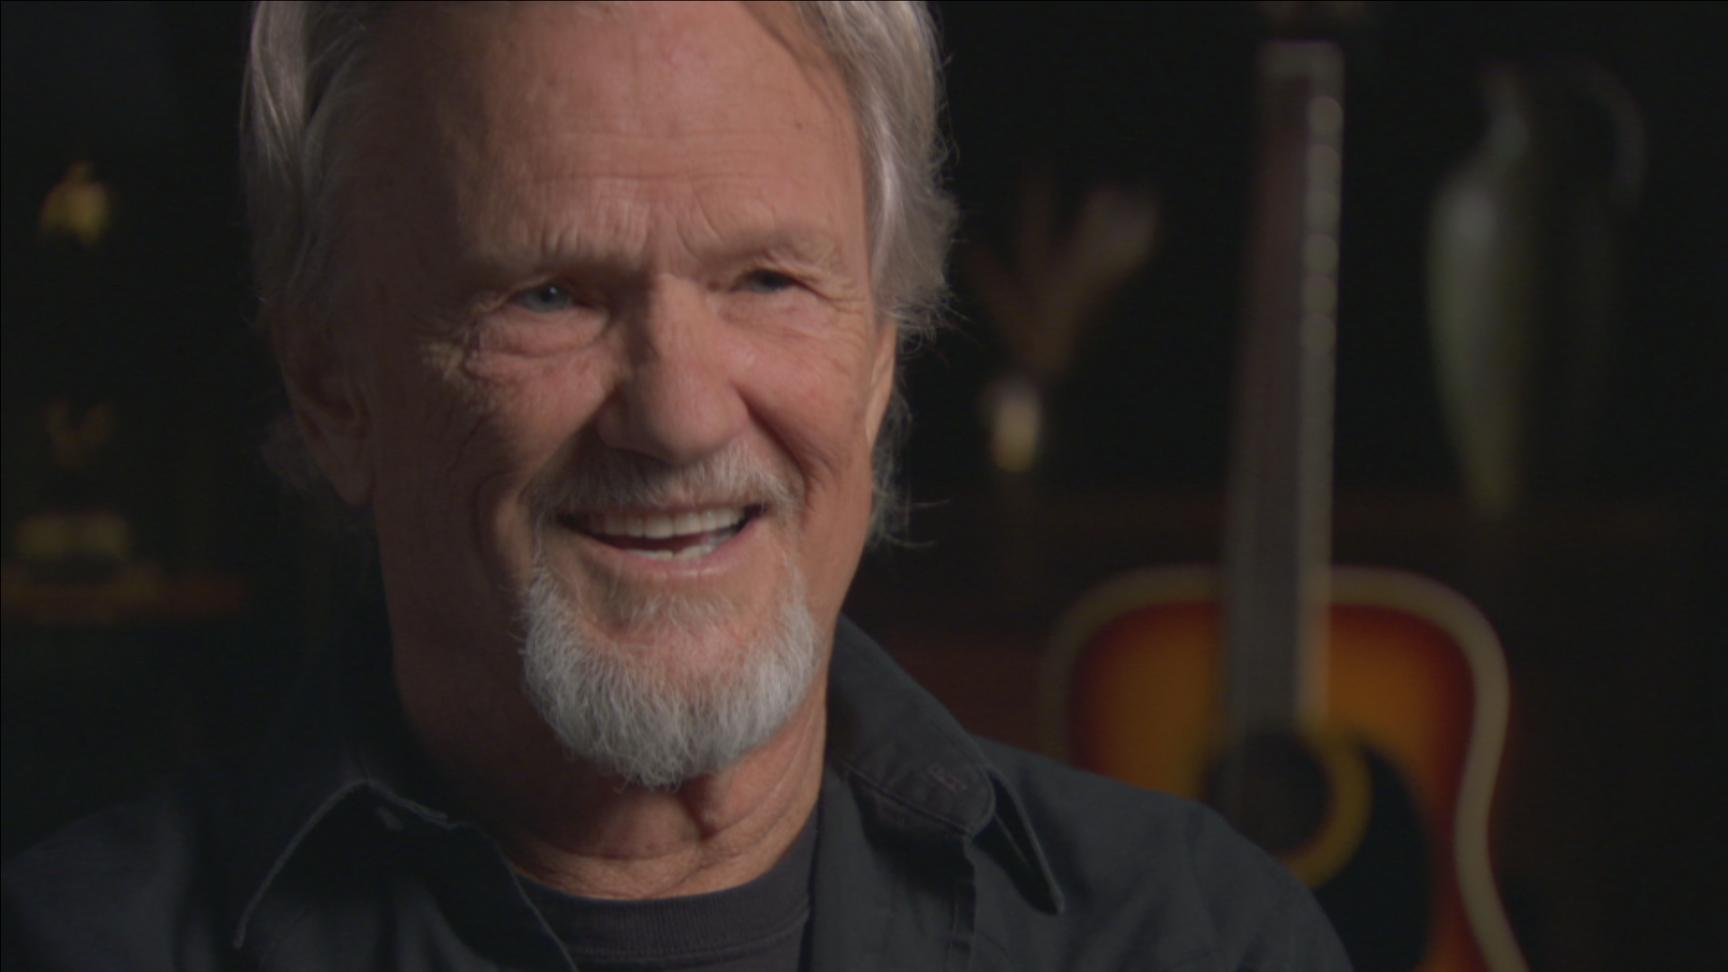 Closeup image of Kris Kristofferson